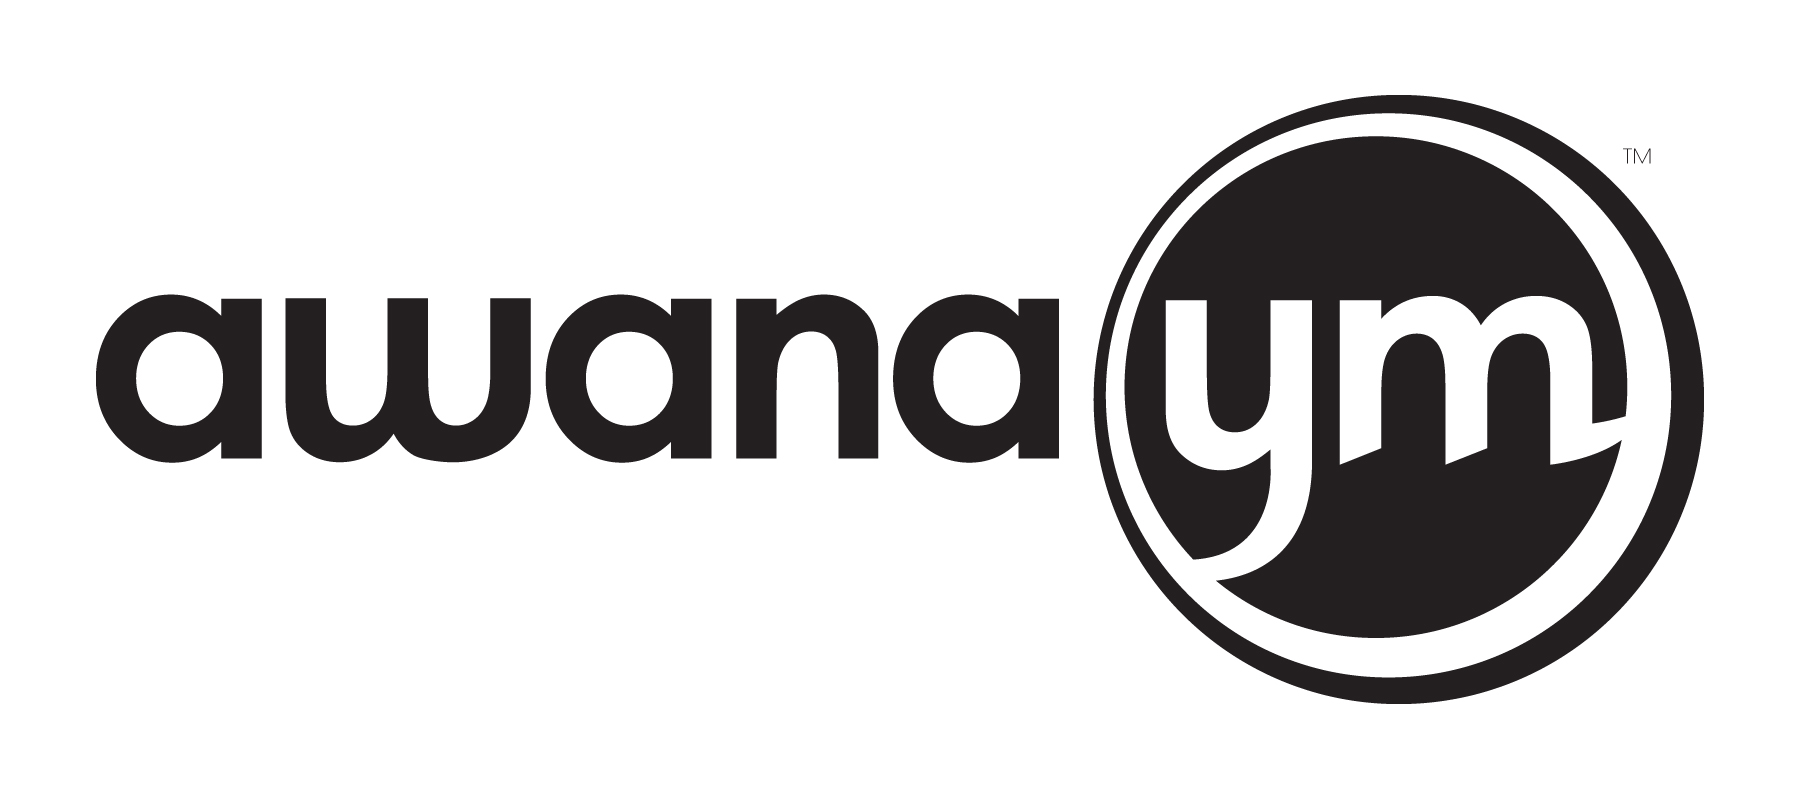 Awana tt clipart picture transparent Awana - Youth Ministries - Clipart picture transparent